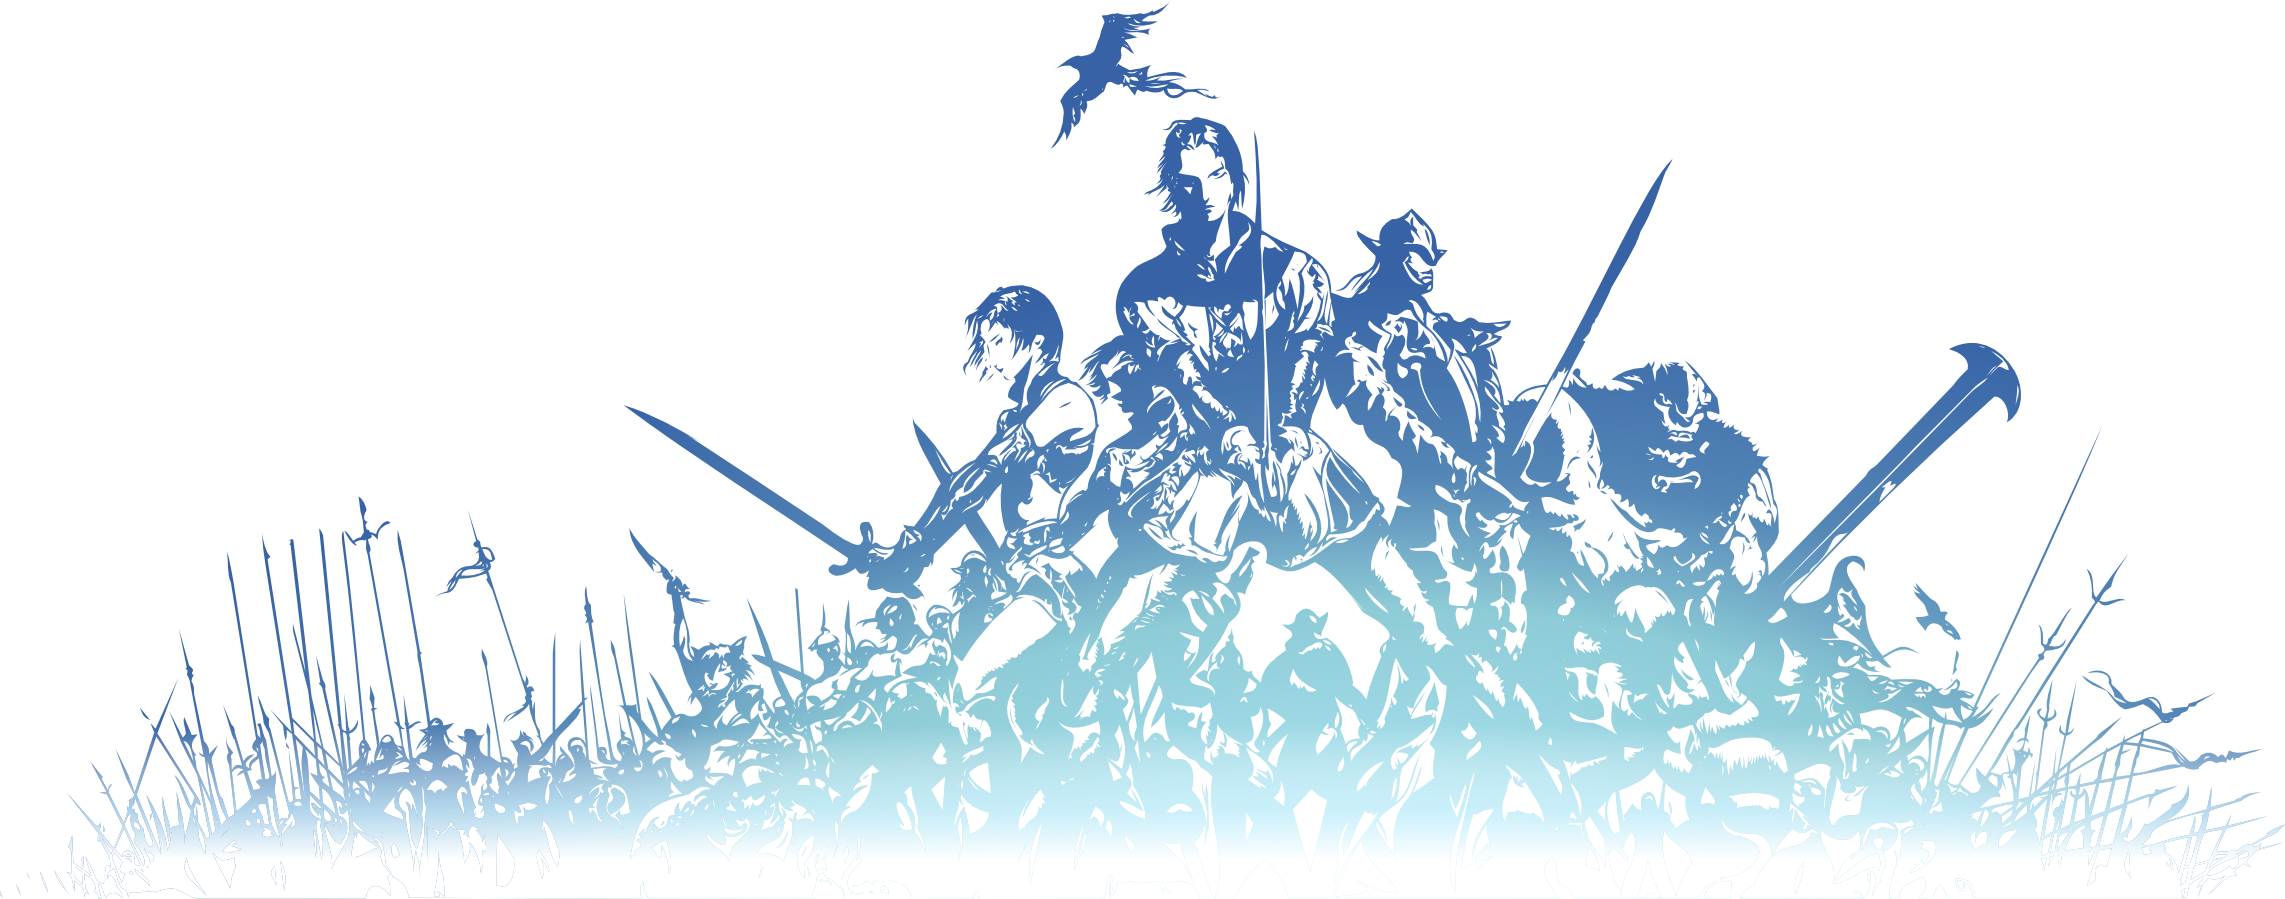 Final fantasy logo art - photo#8